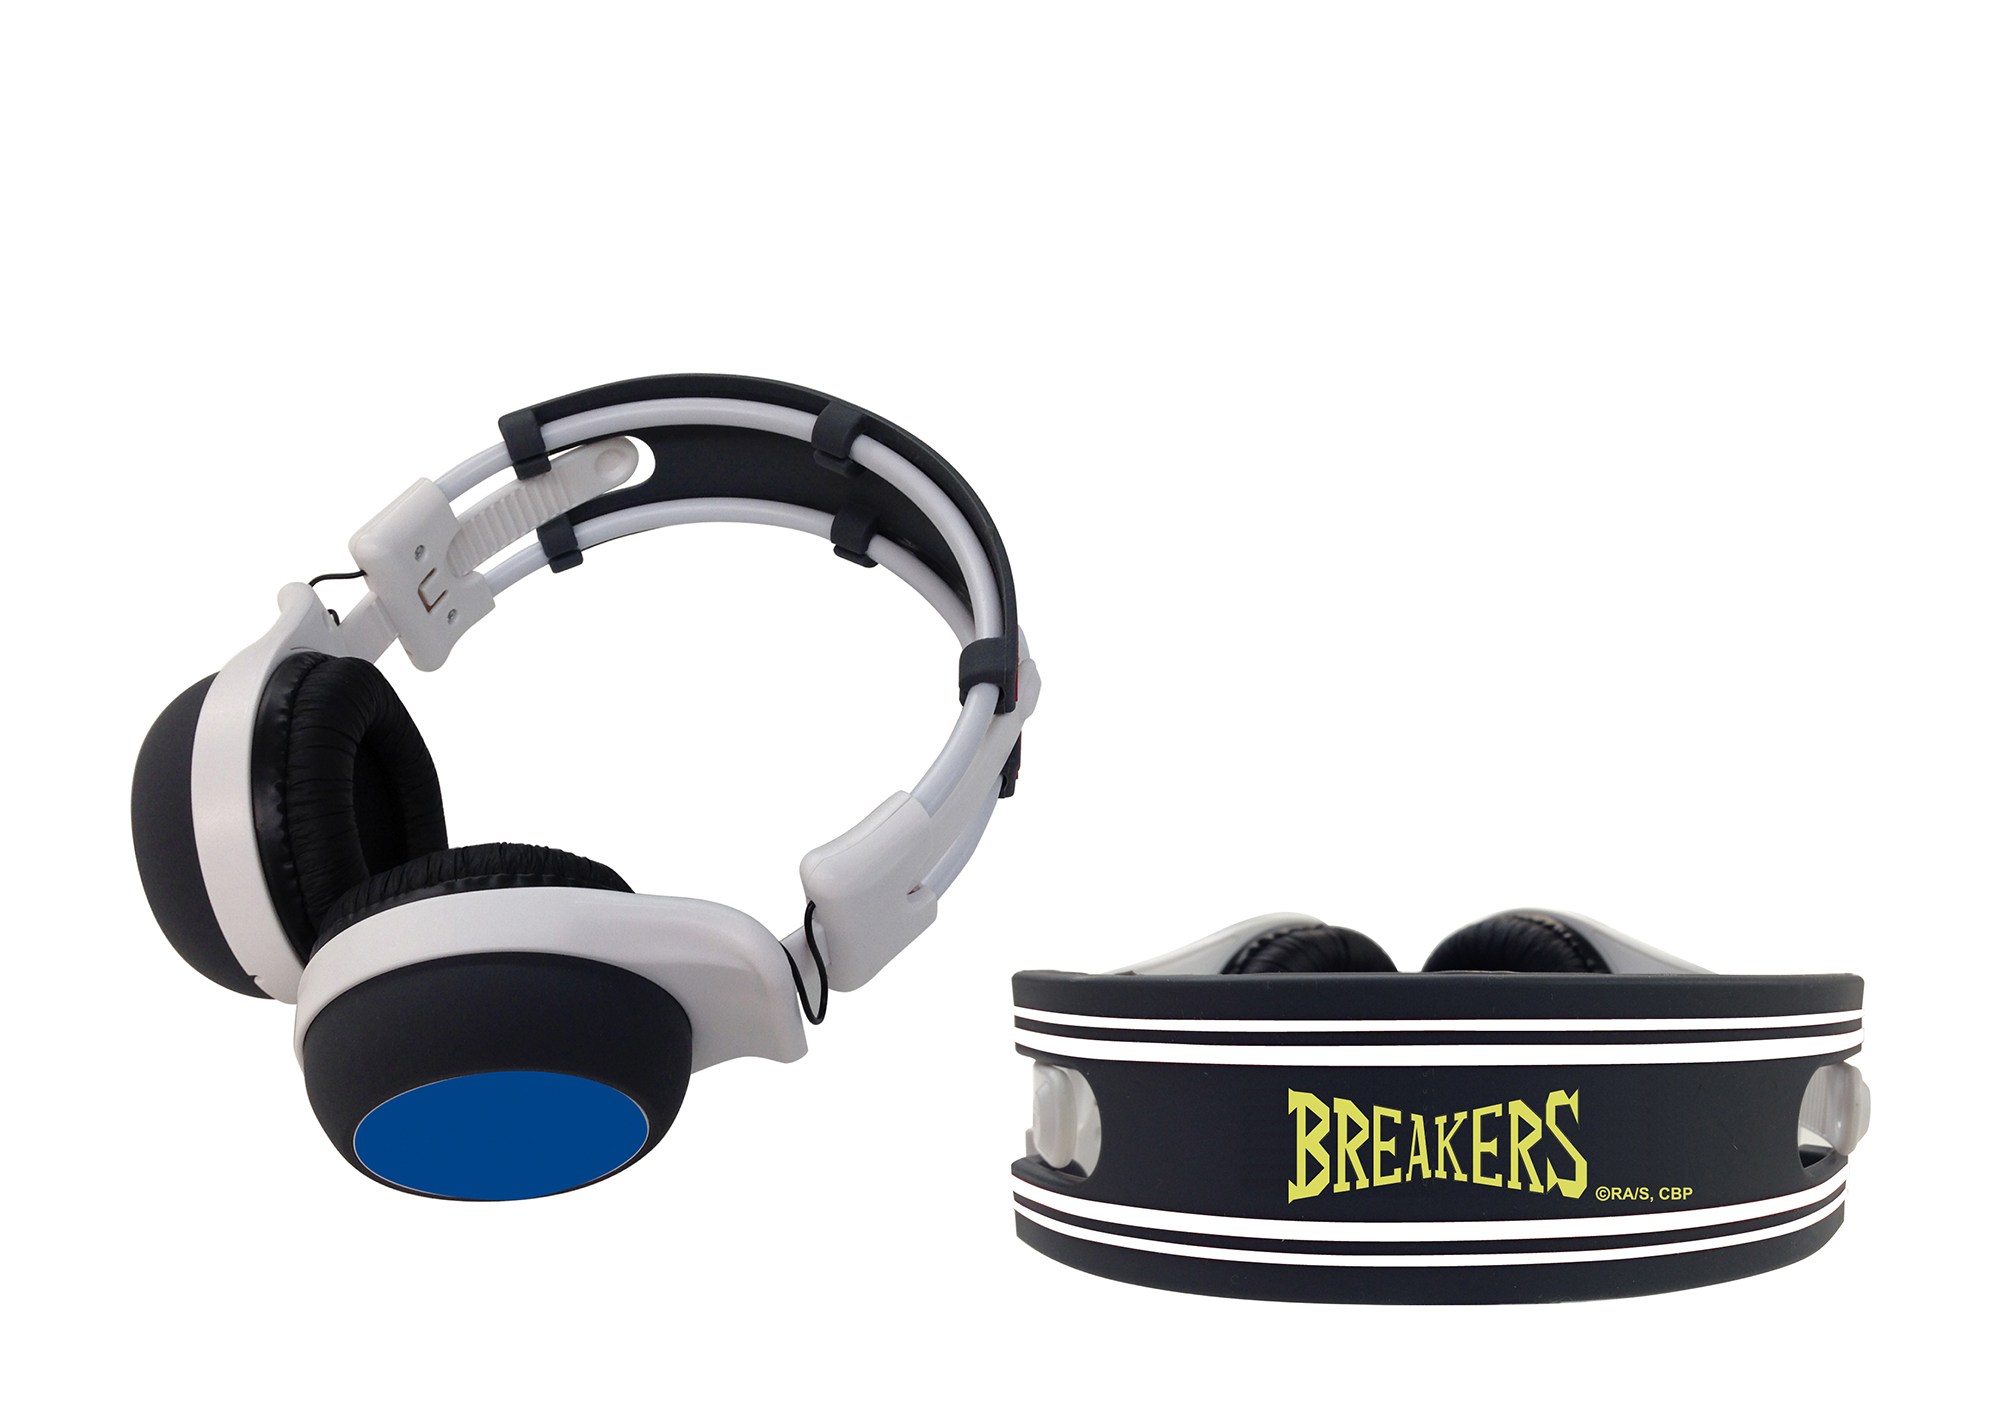 BREAKERSヘッドフォン